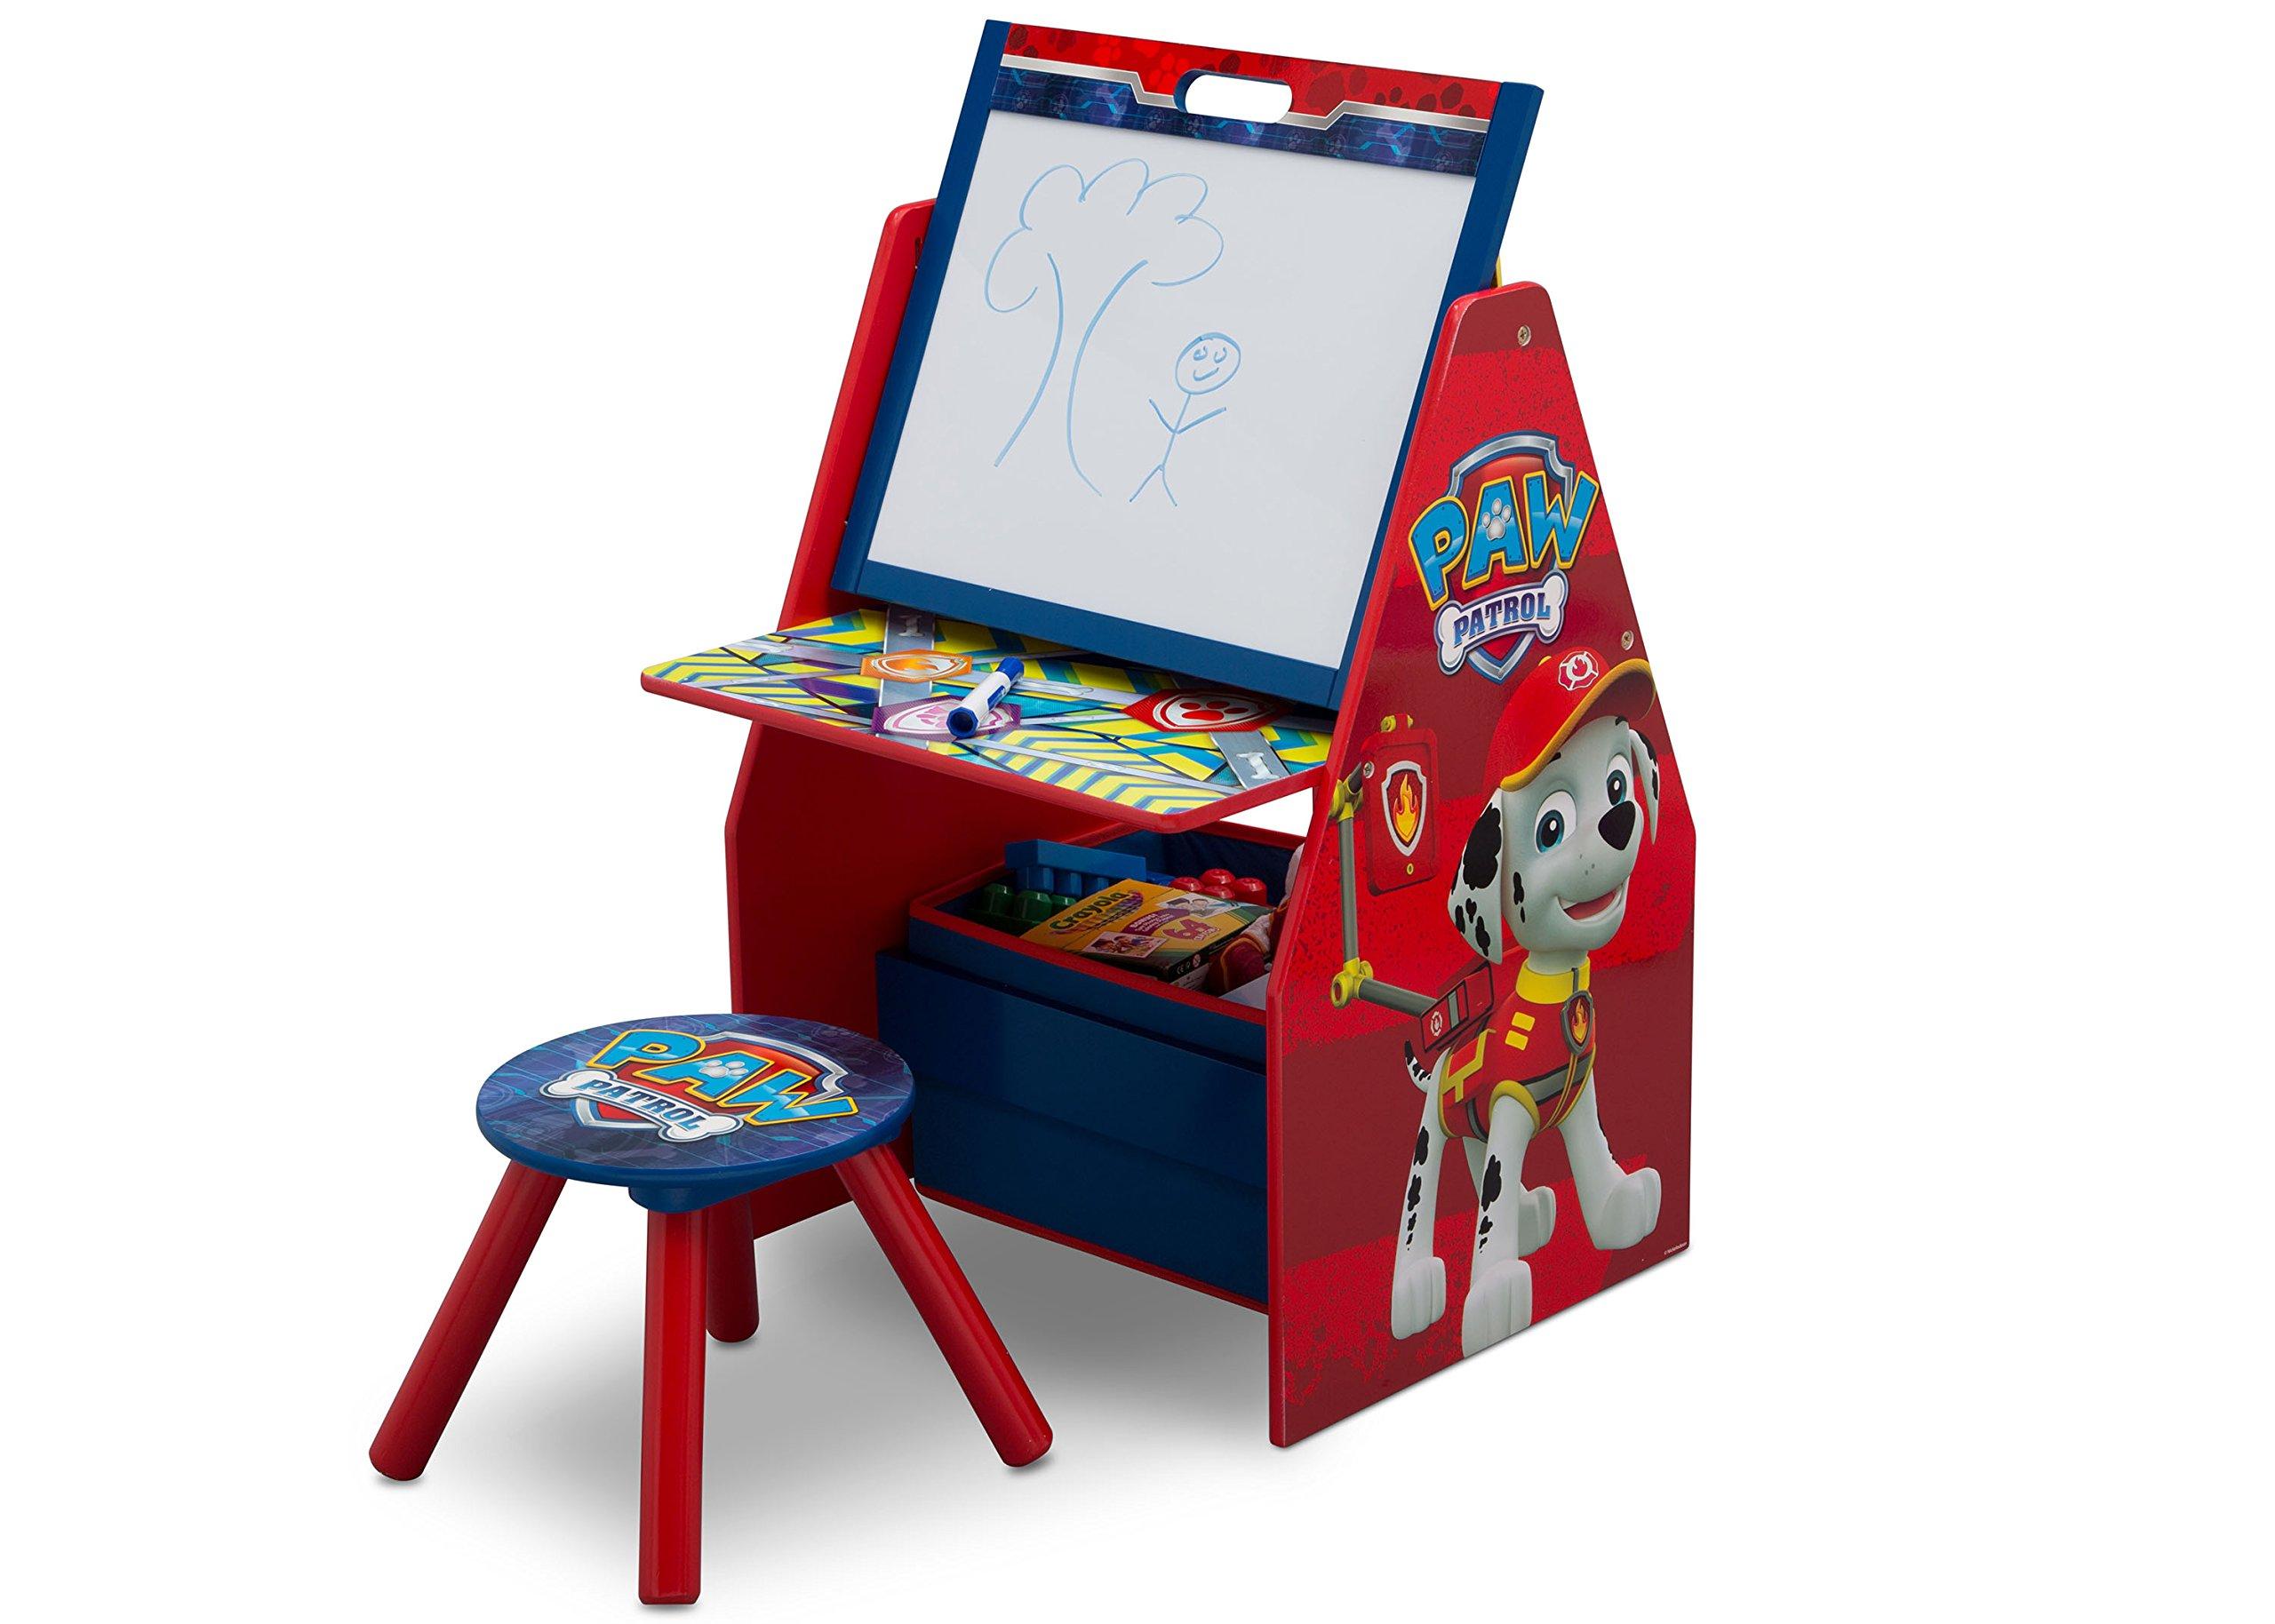 Amazon.com : delta children activity center with easel desk stool